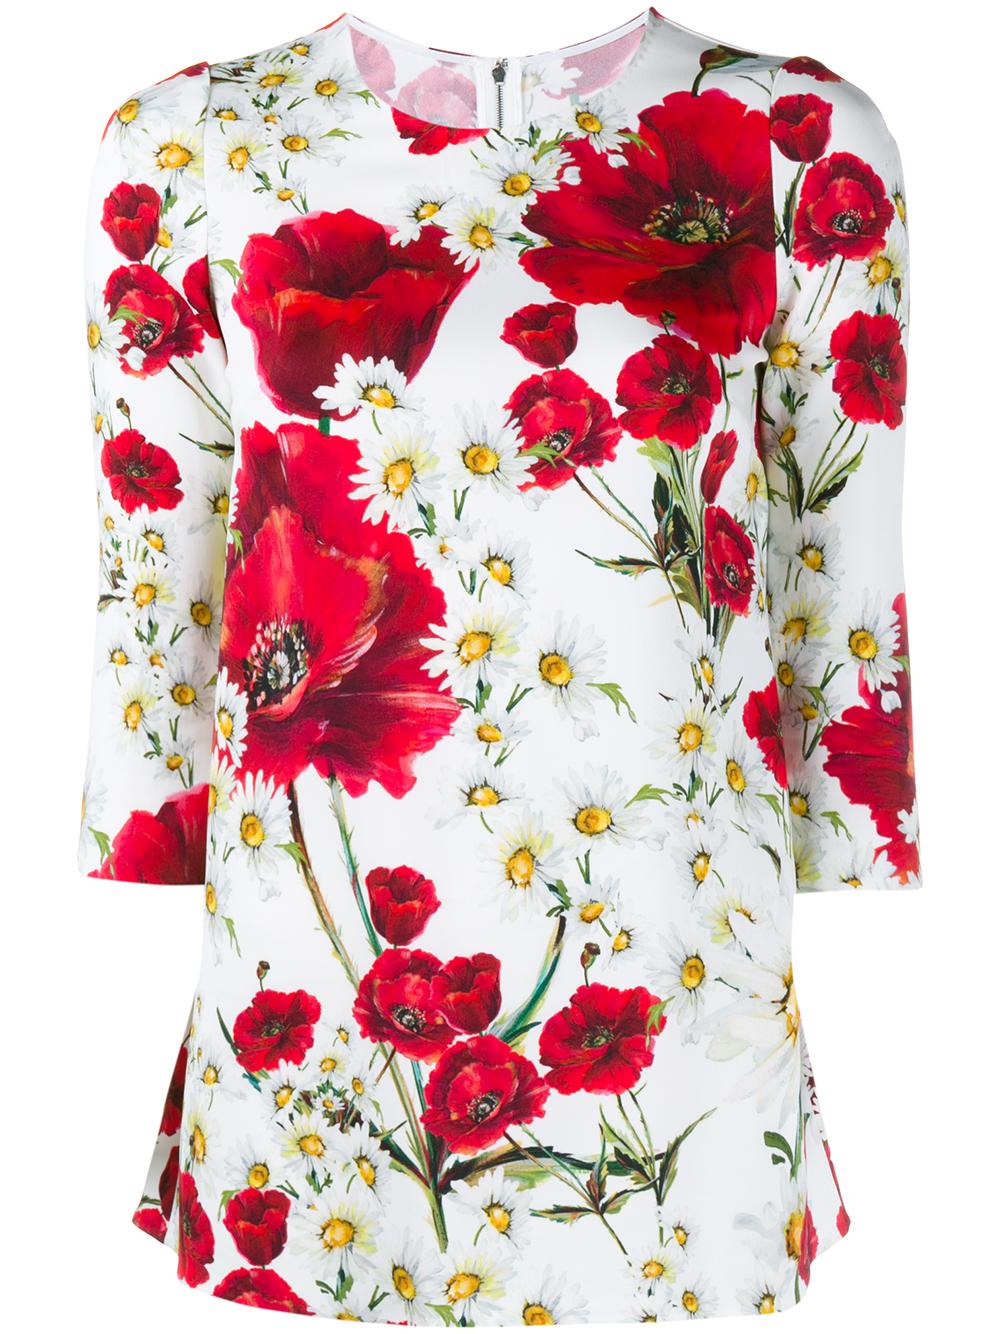 White Shirt With Floral Design Lauren Goss